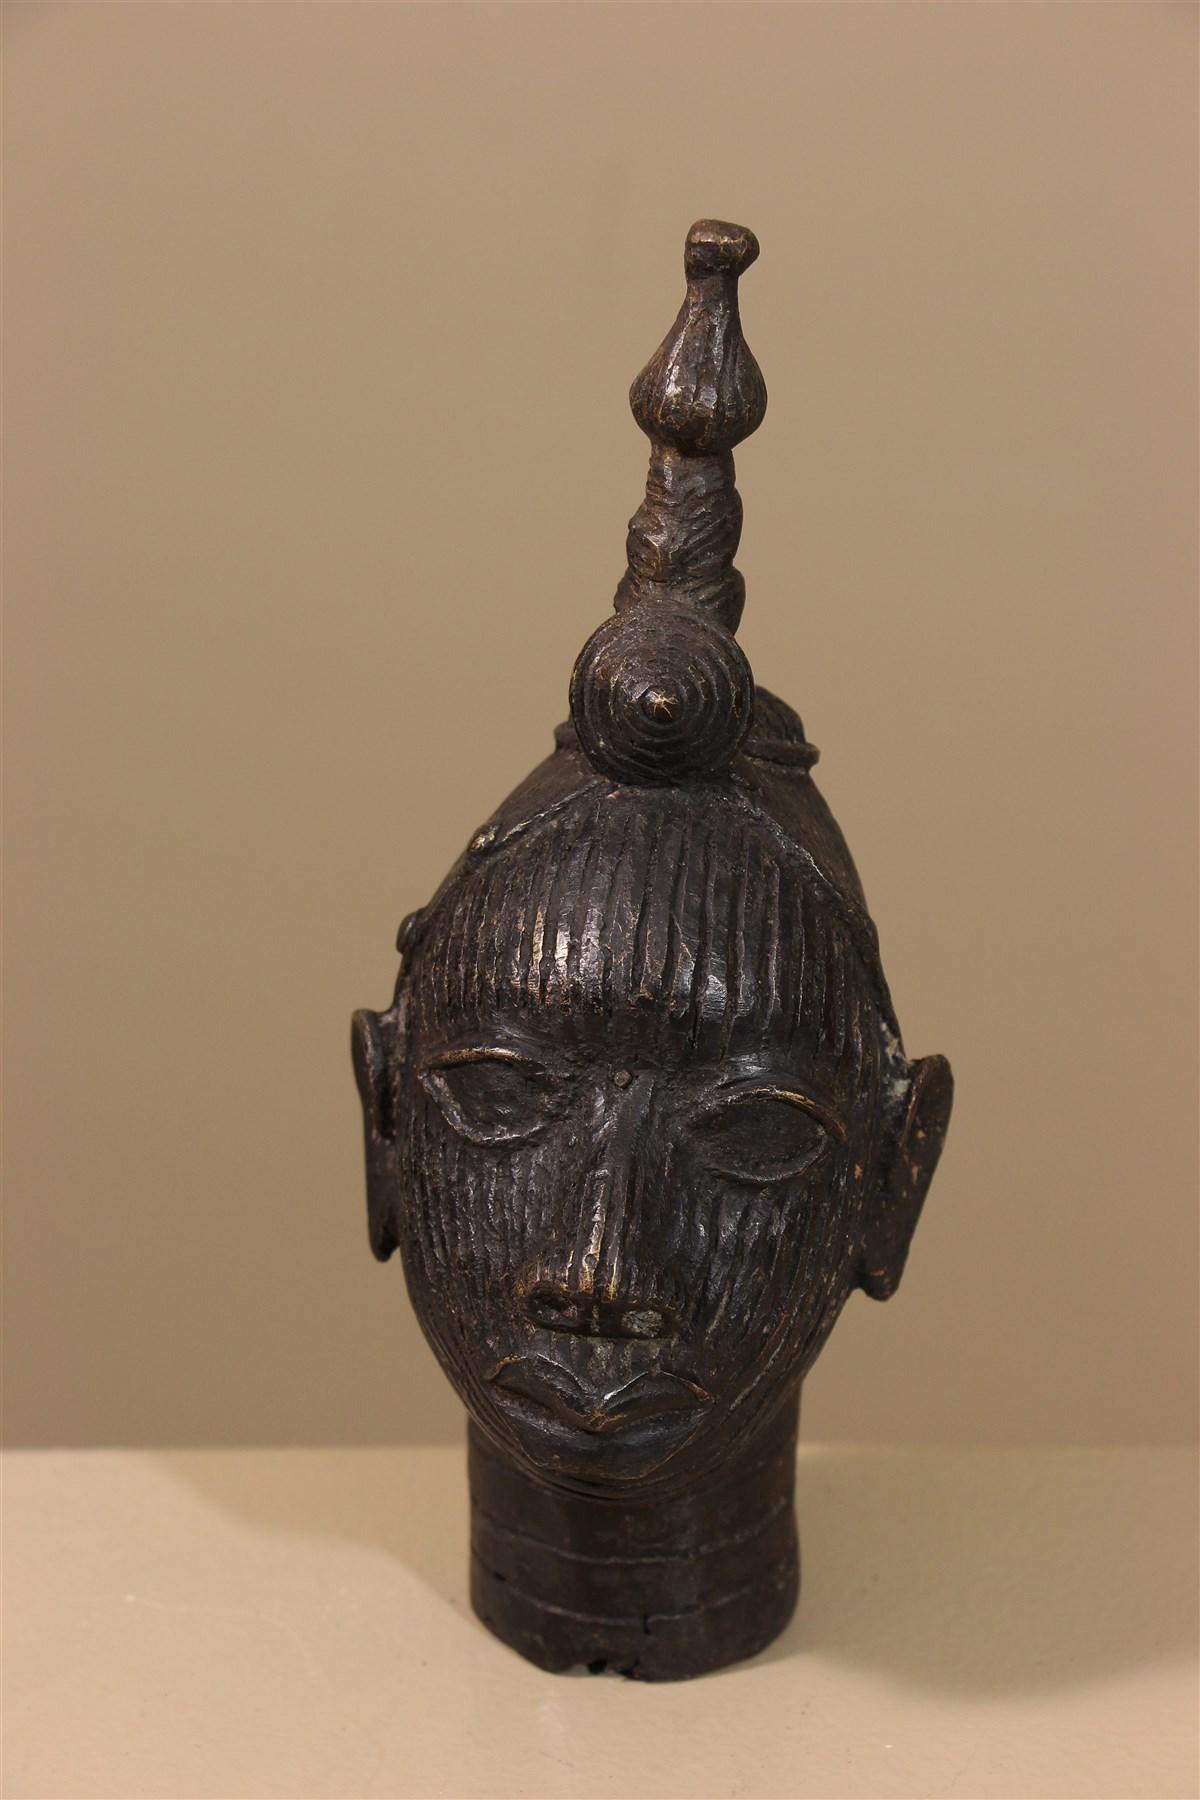 Tête Ifé du Nigeria en bronze